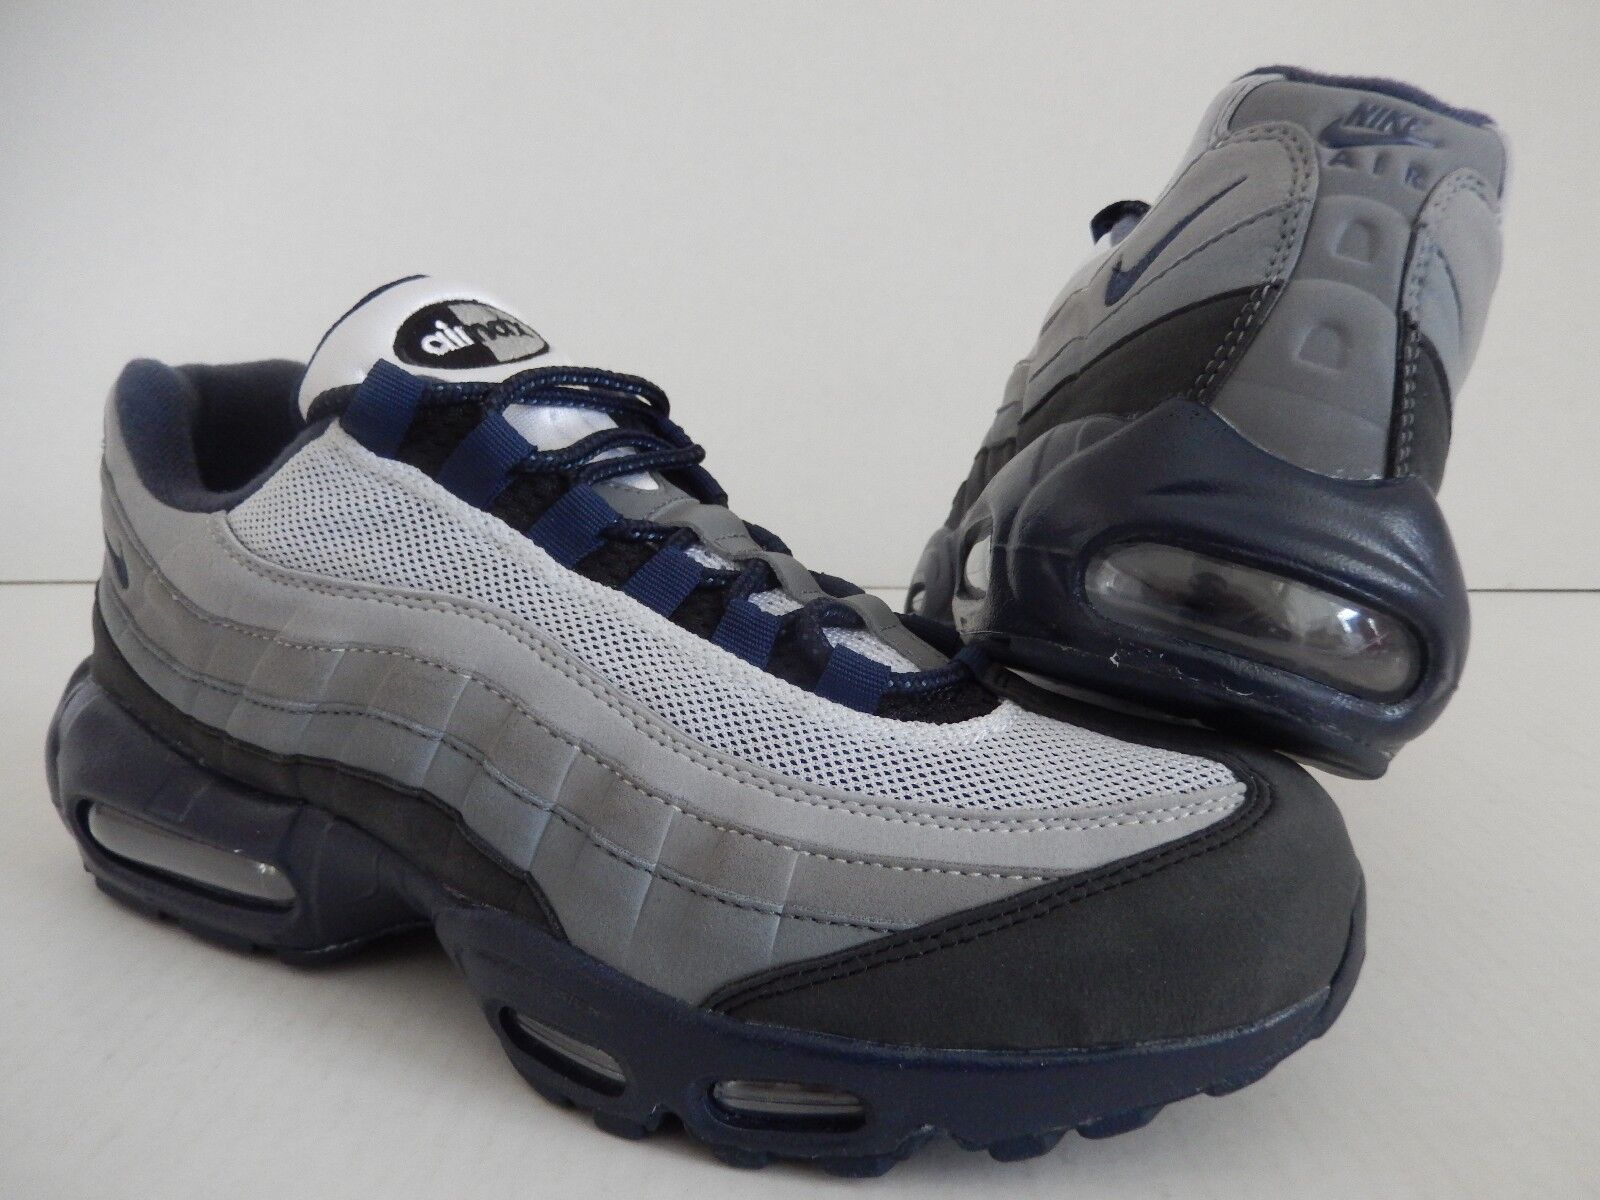 Nike Max 95 ID gris-Azul Marca 10 Parker HTM Talla 10 Marca para mujer hombre Talla 8.5 495d4a